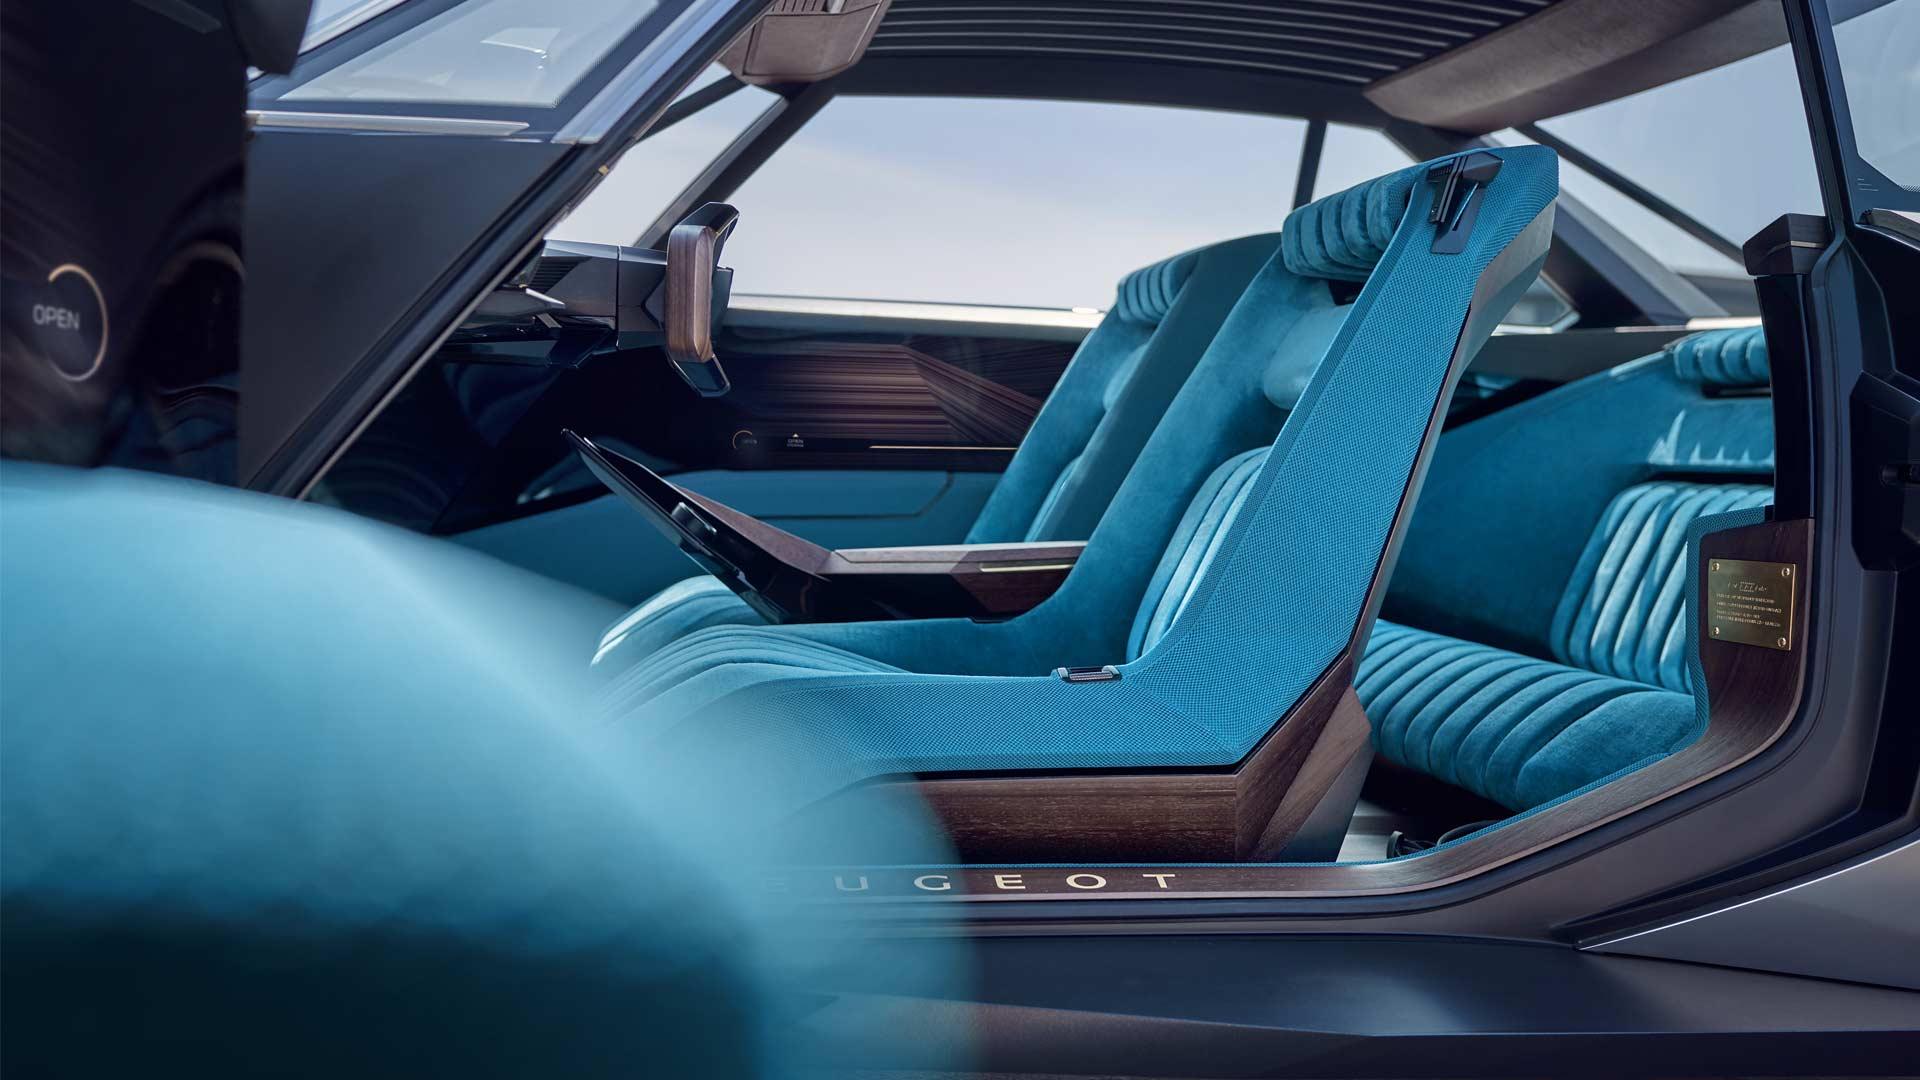 Peugeot-e-Legend-Concept-Interior_4